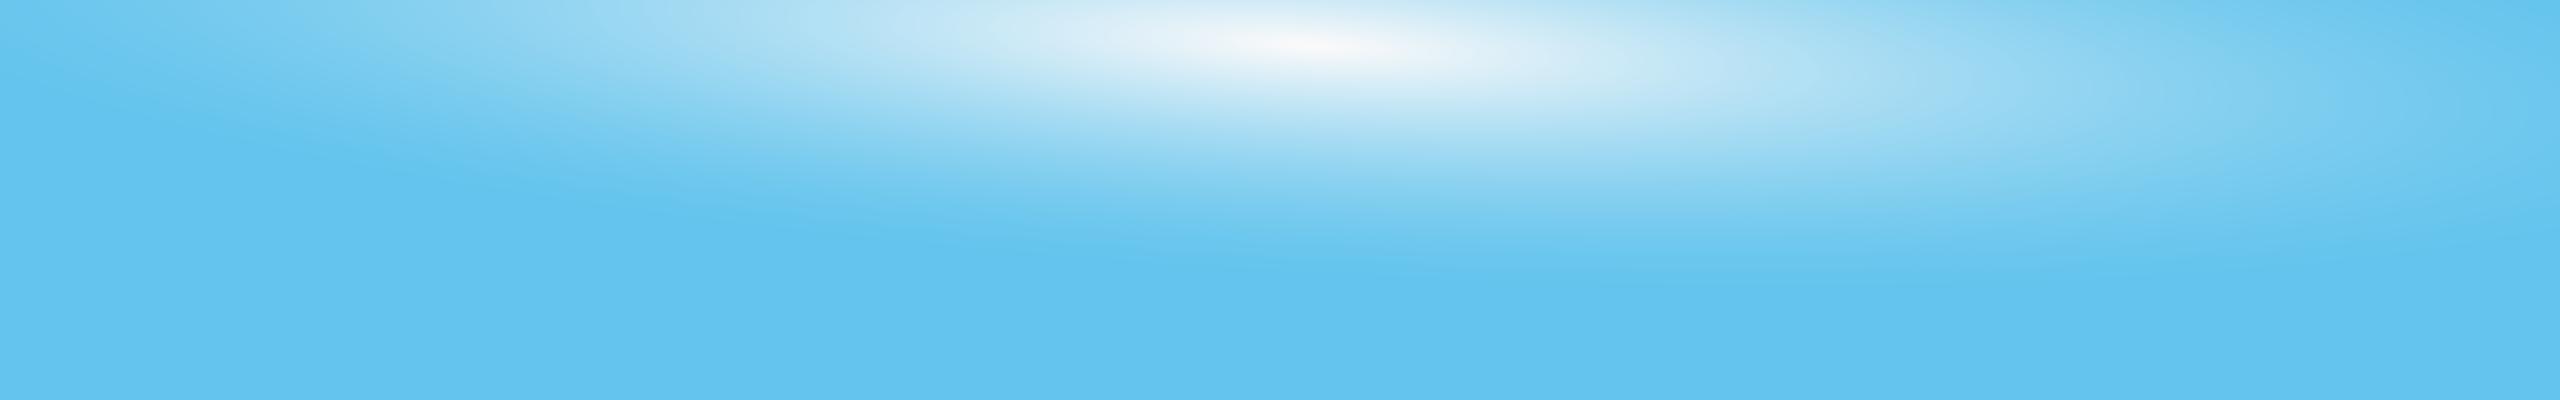 blue-slider-background